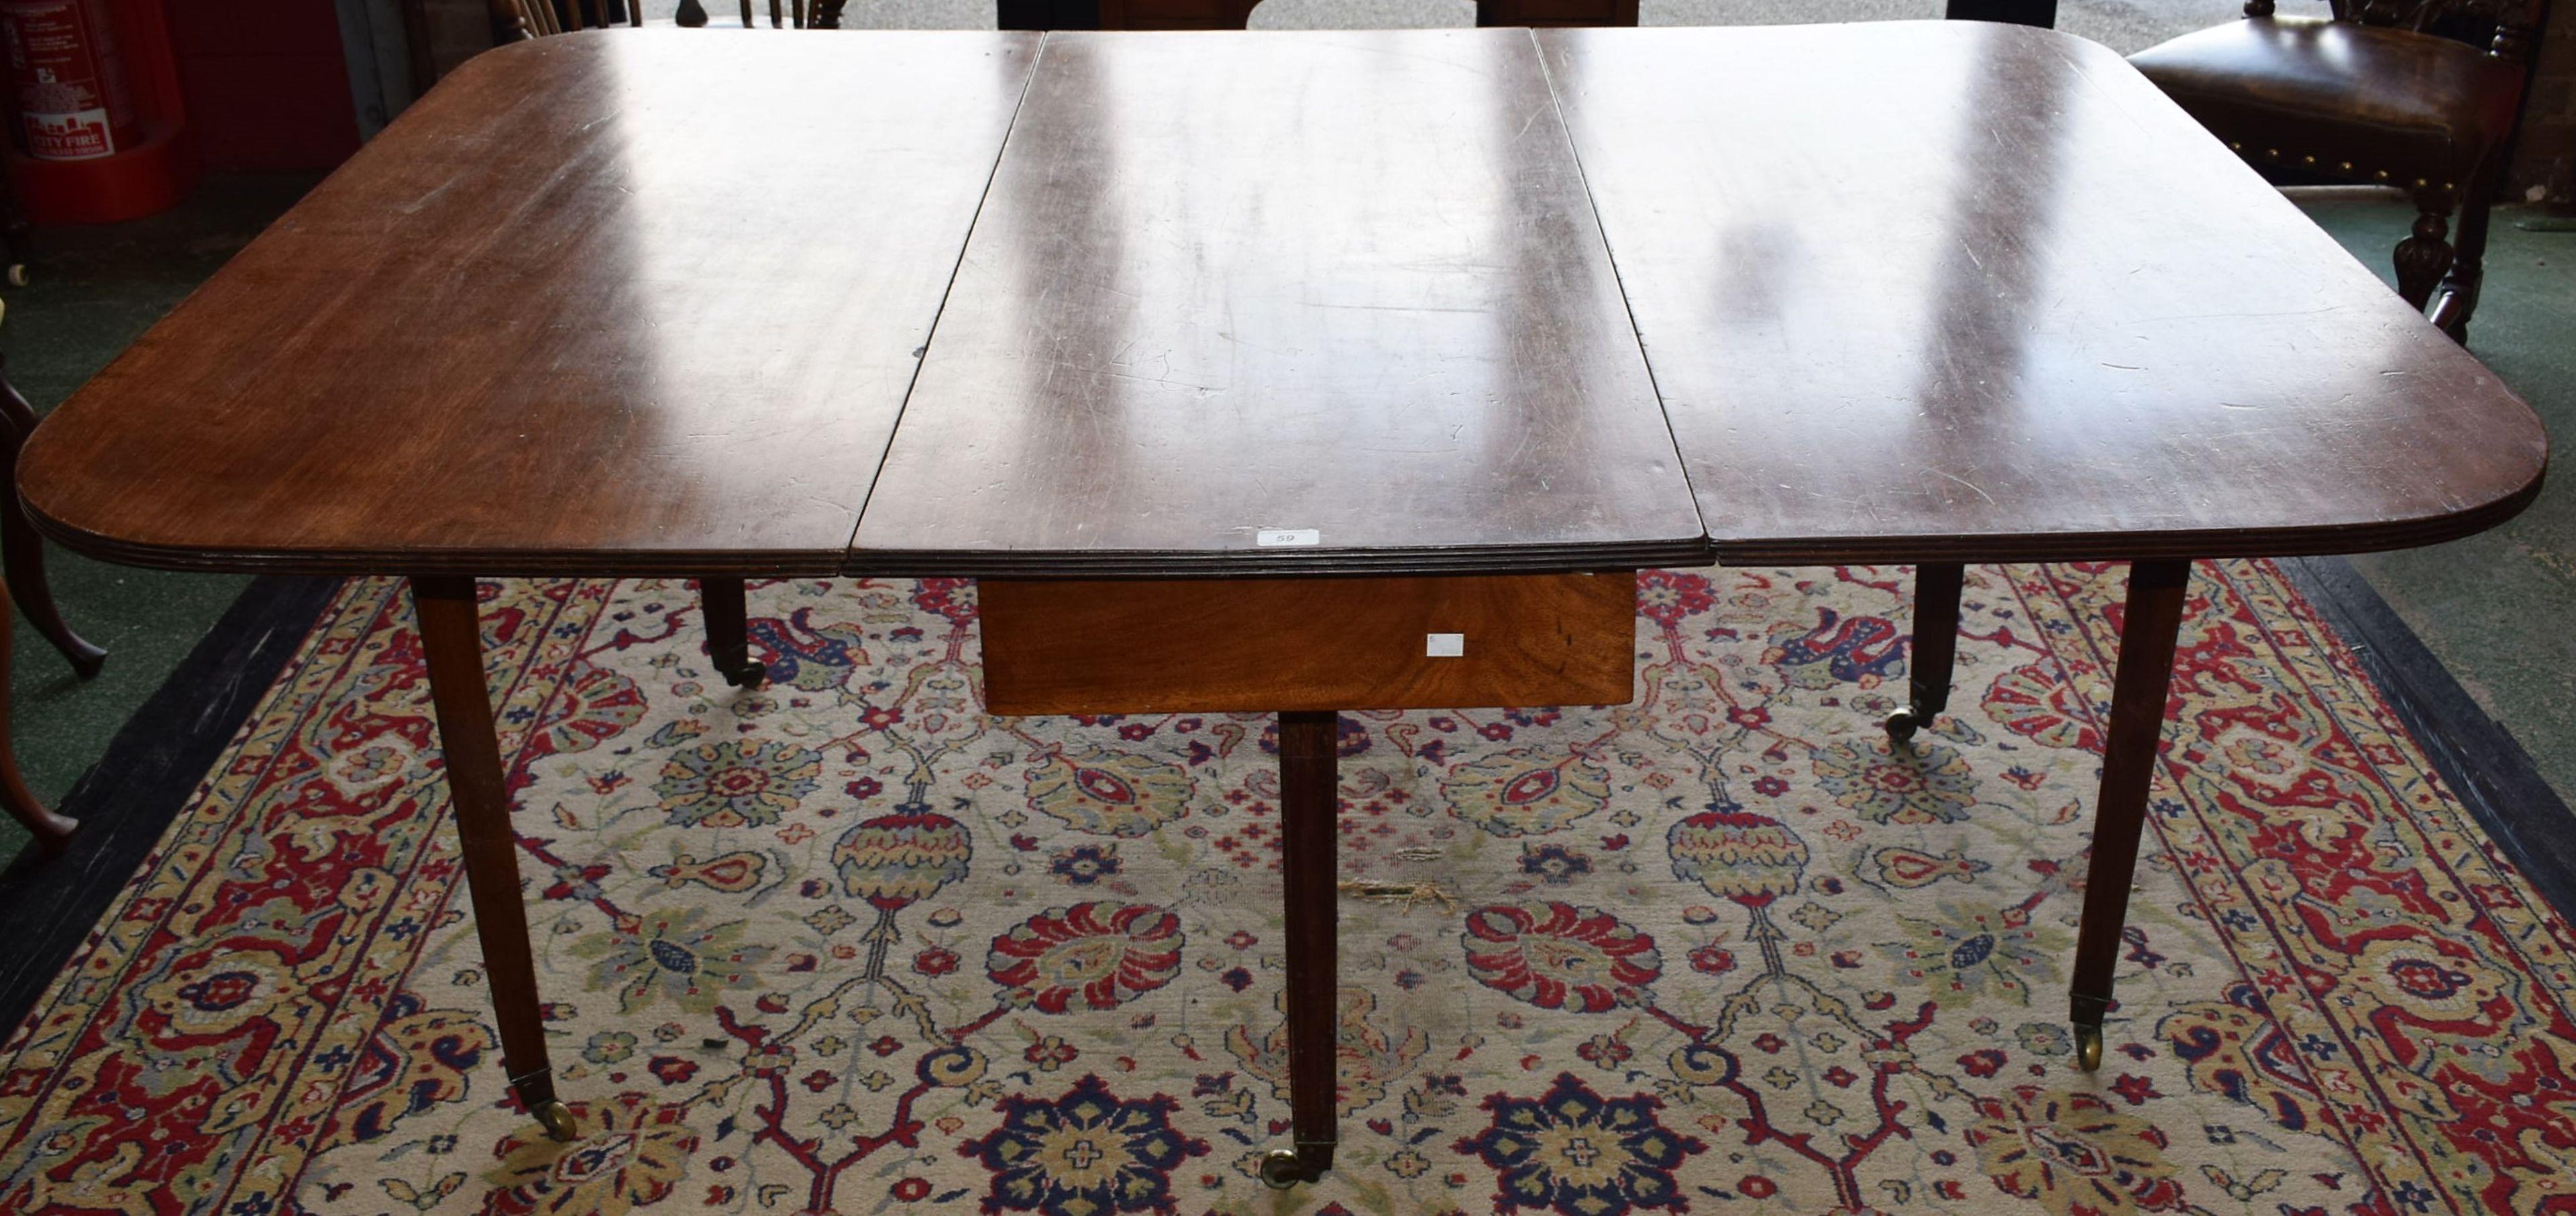 Lot 59 - A 19th century mahogany gateleg dining table,